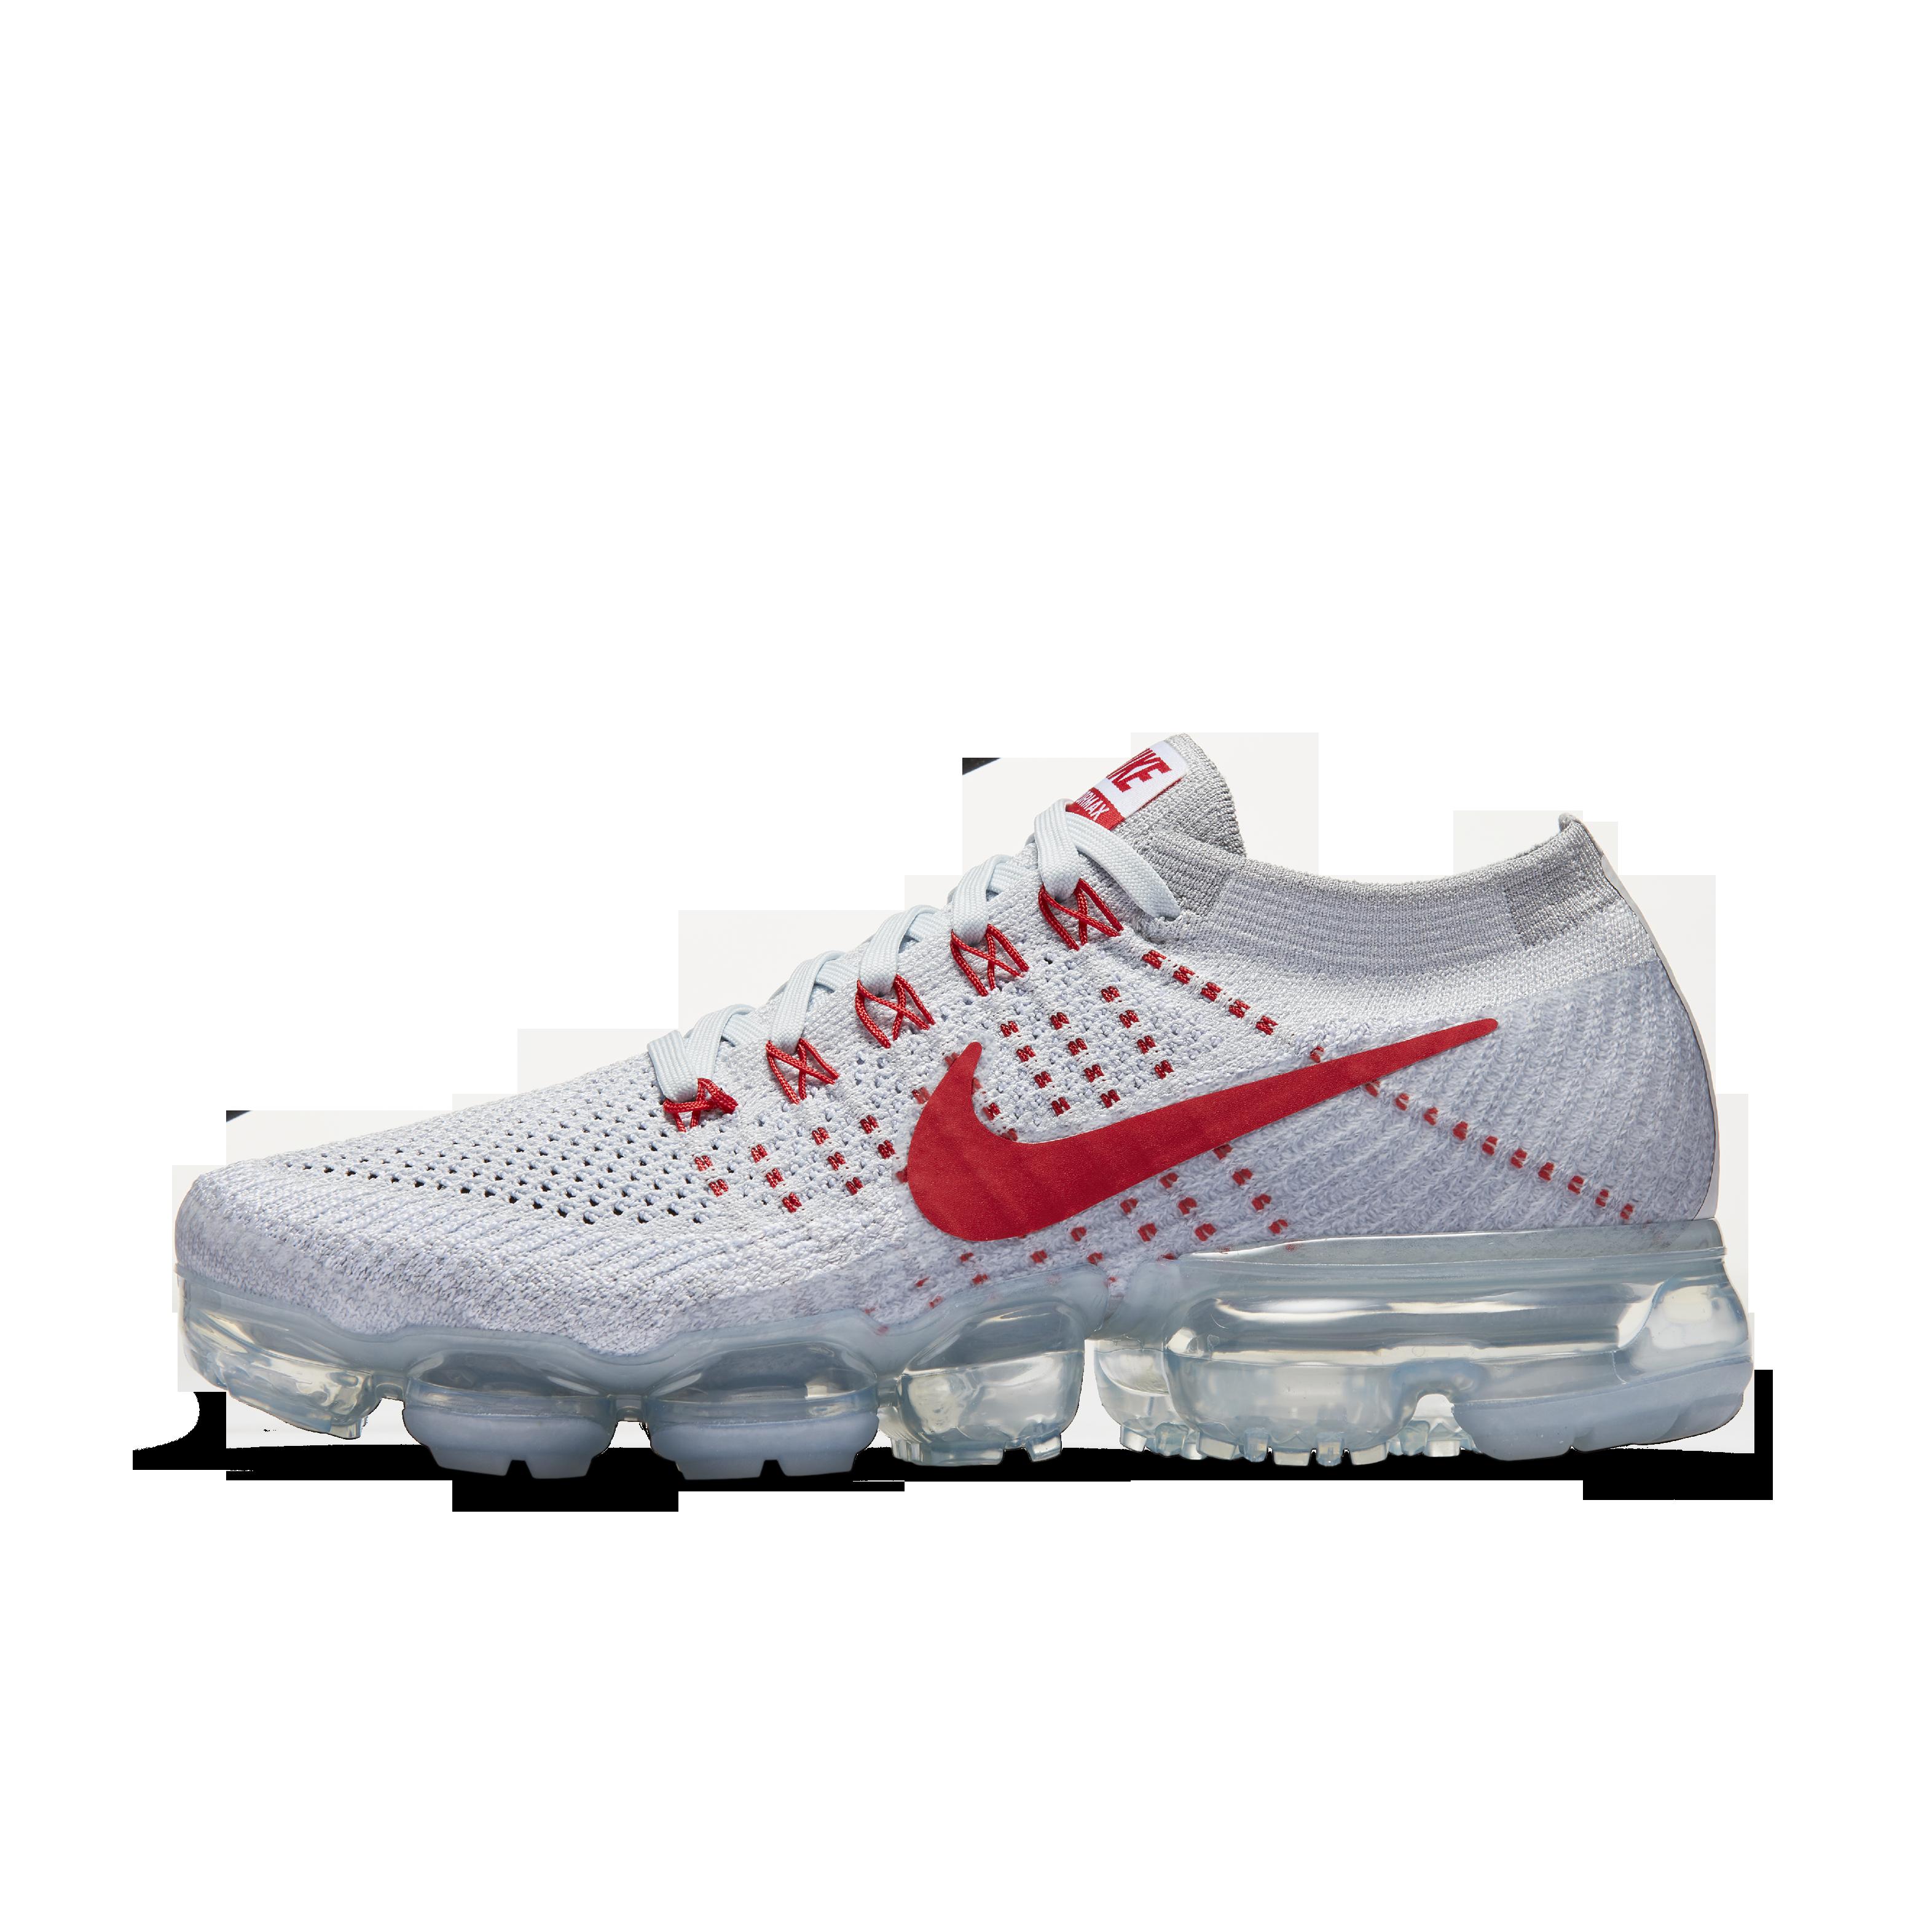 1258b997735 ... uk cheap nike air vapormax flyknit womens running shoes lowest price  9511c 504fd